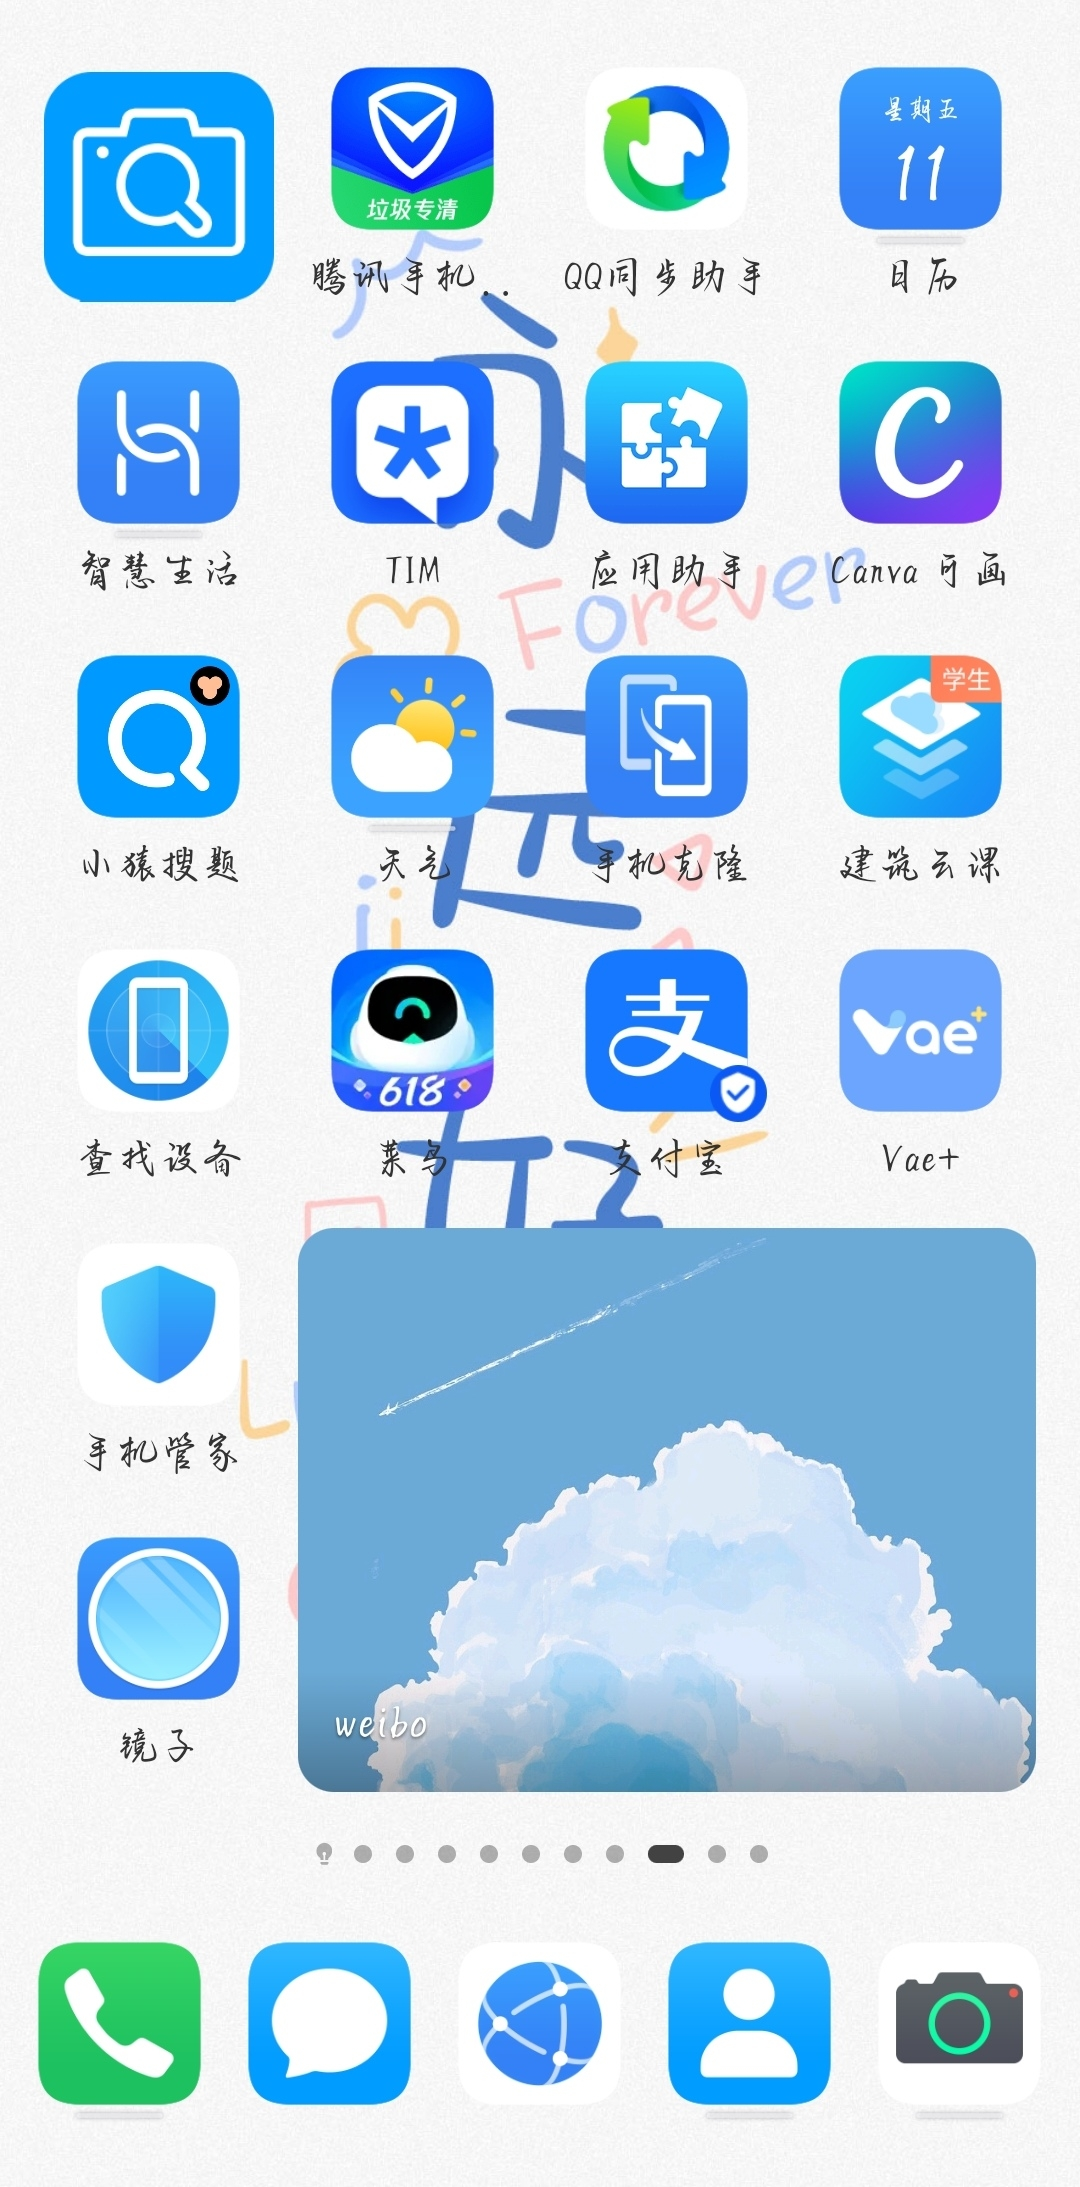 Screenshot_20210611_123857_com.huawei.android.launcher_edit_152779687735541.jpg